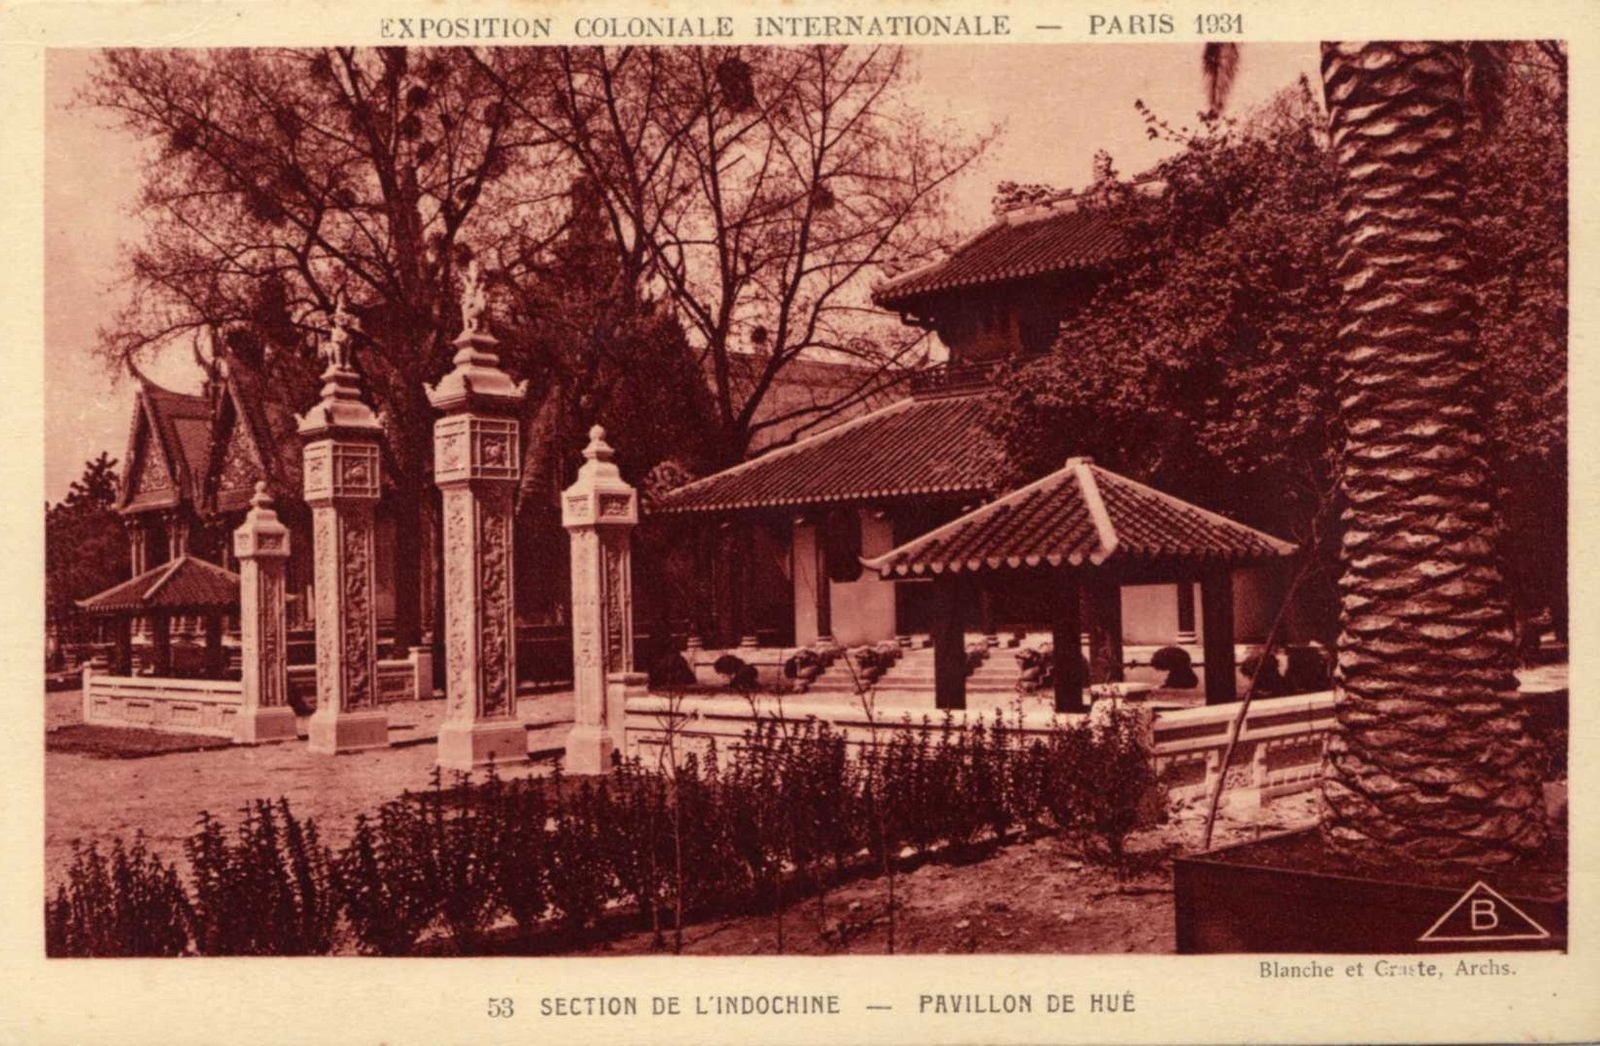 Hue -  Pavillon